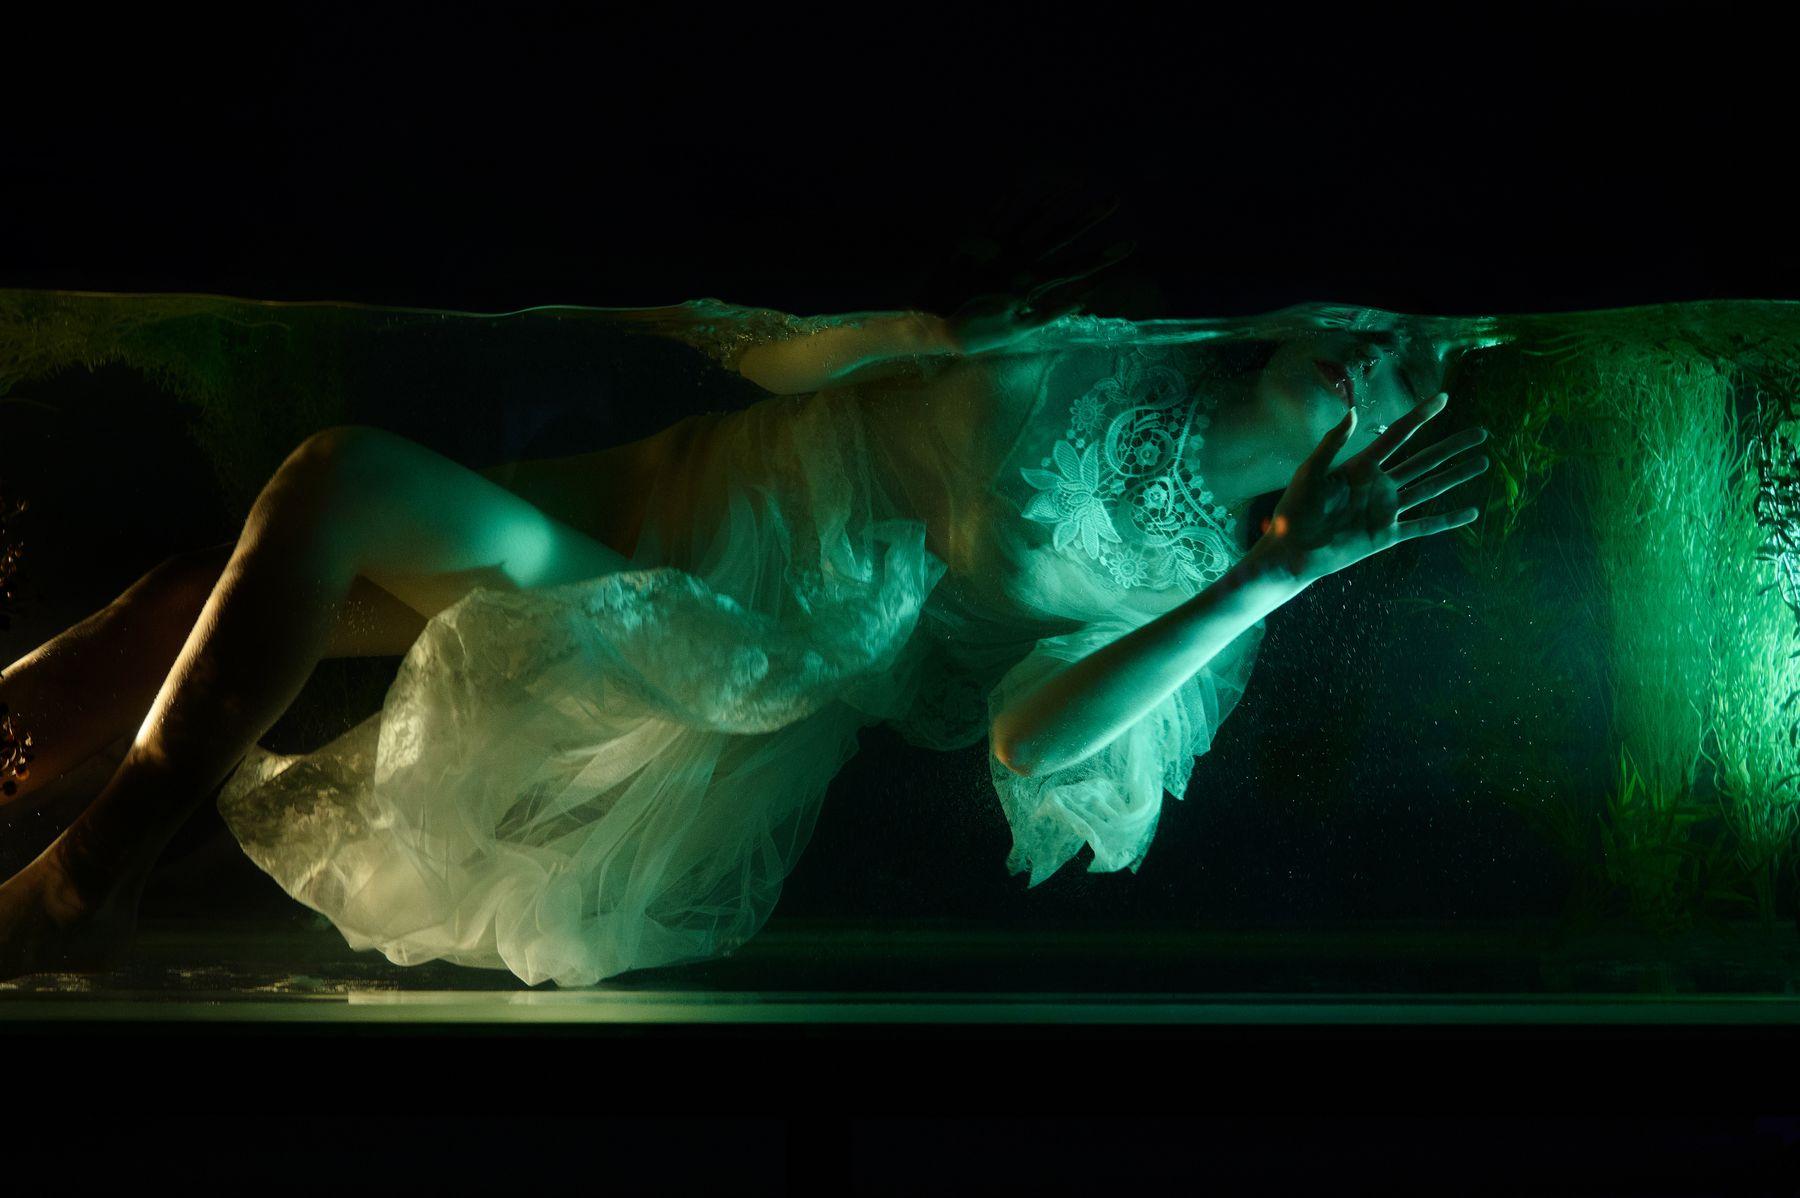 Amphitrite вода подводой девушка платье fashion порьтрет nikon z6ii dedolight underwater модель